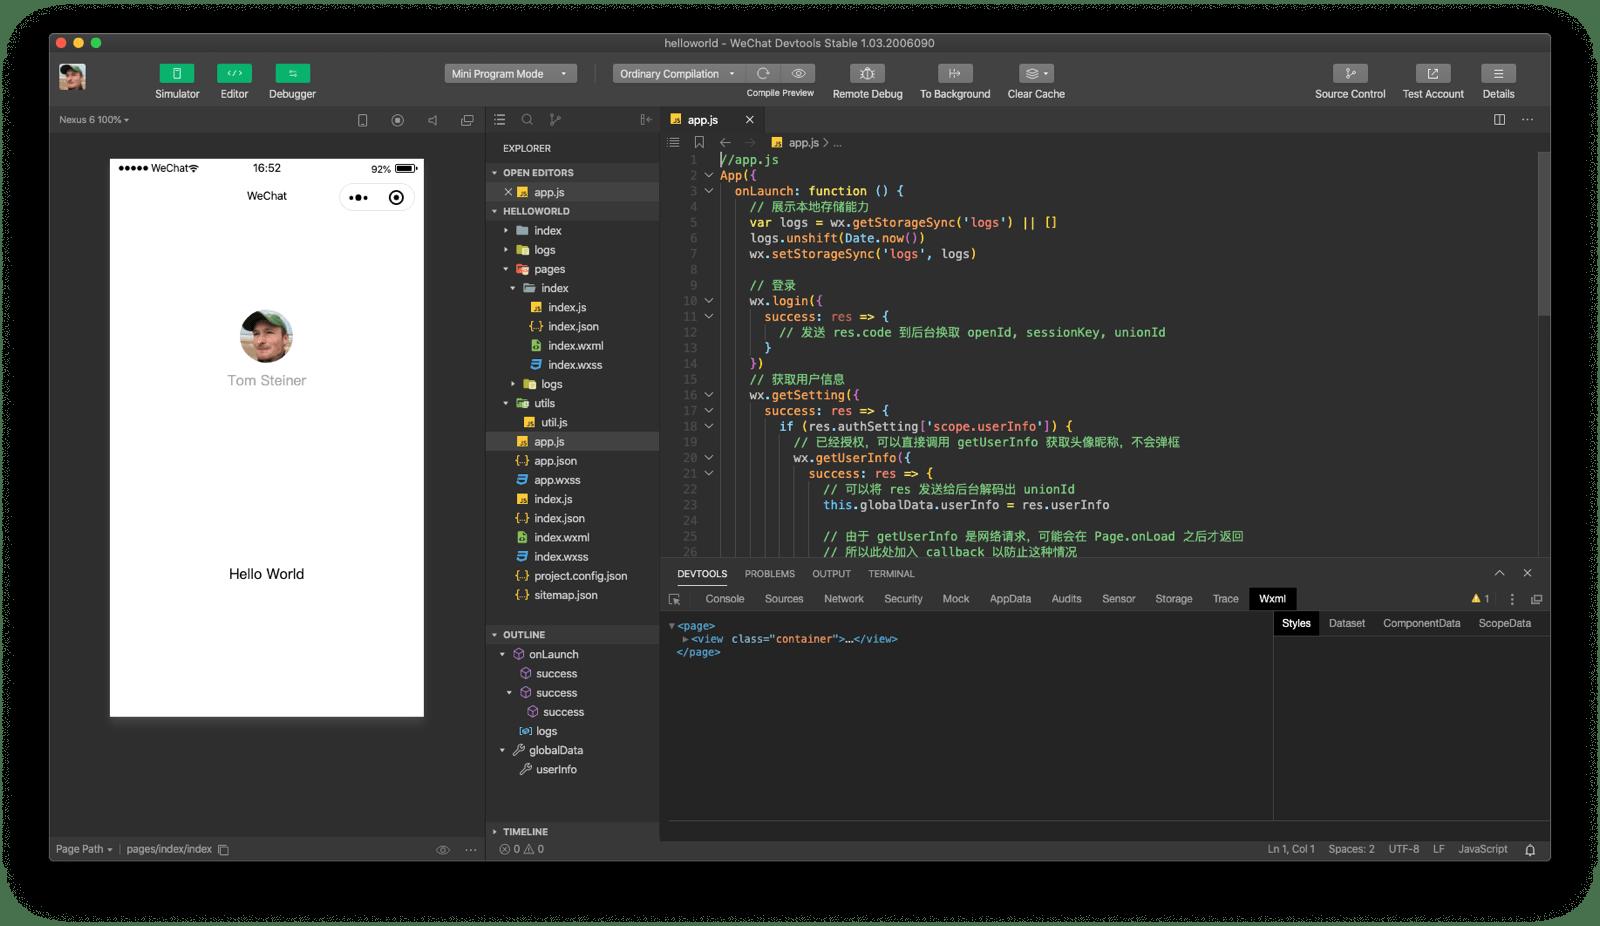 WeChat DevTools application window showing simulator, code editor, and debugger.